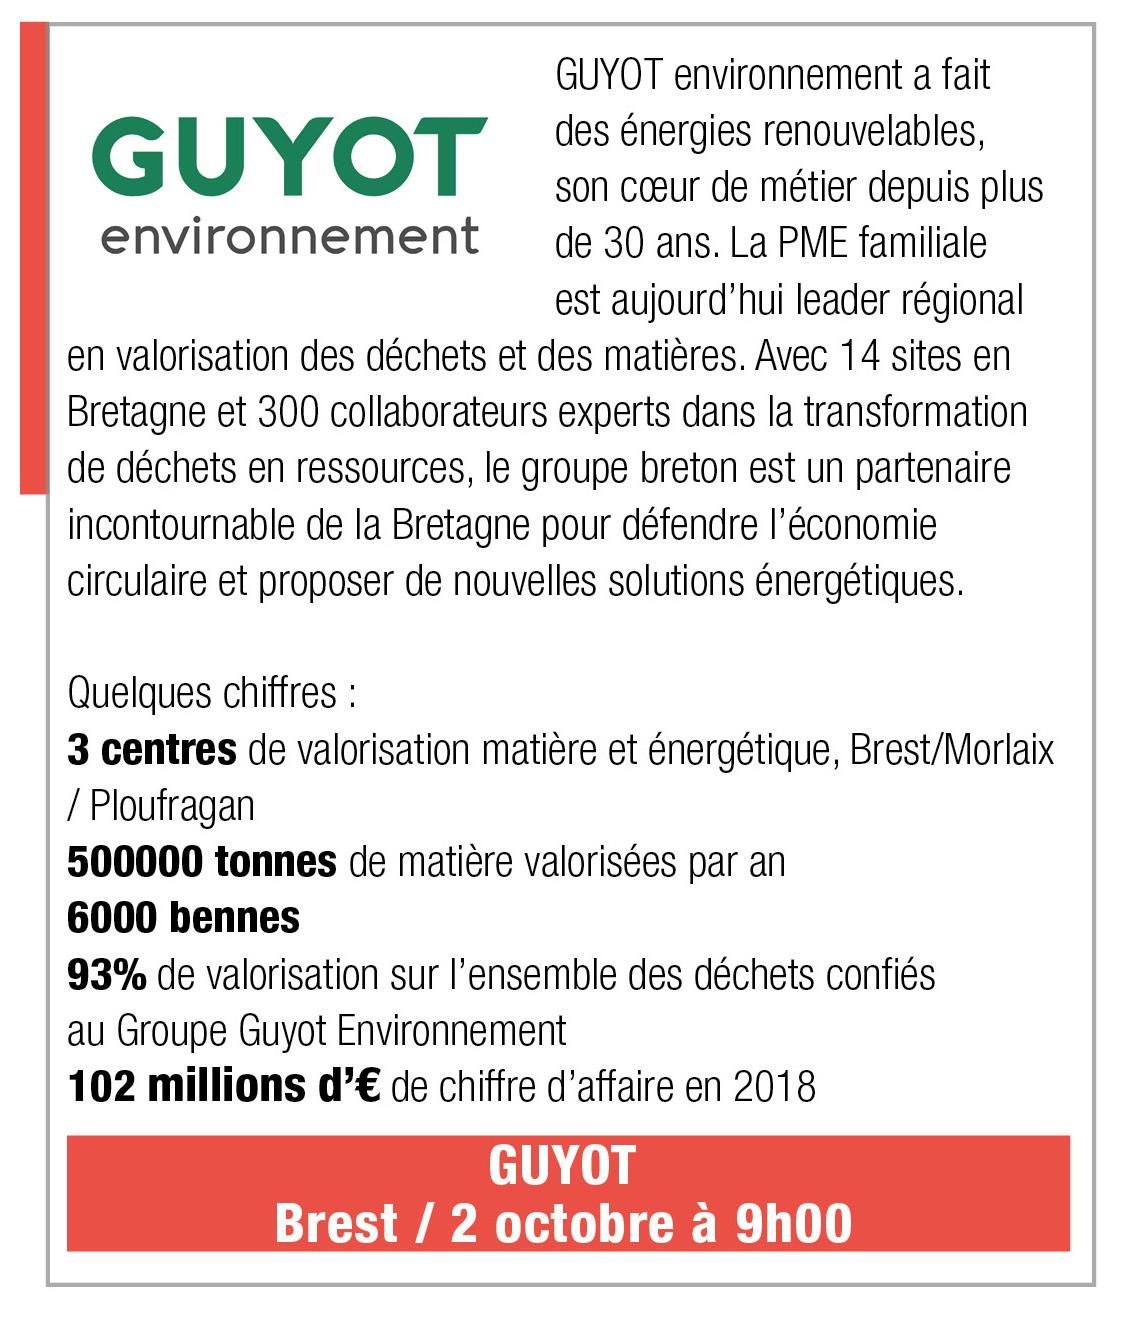 Inscription Guyot Environnement, 2 octobre 2019, 9h, Brest